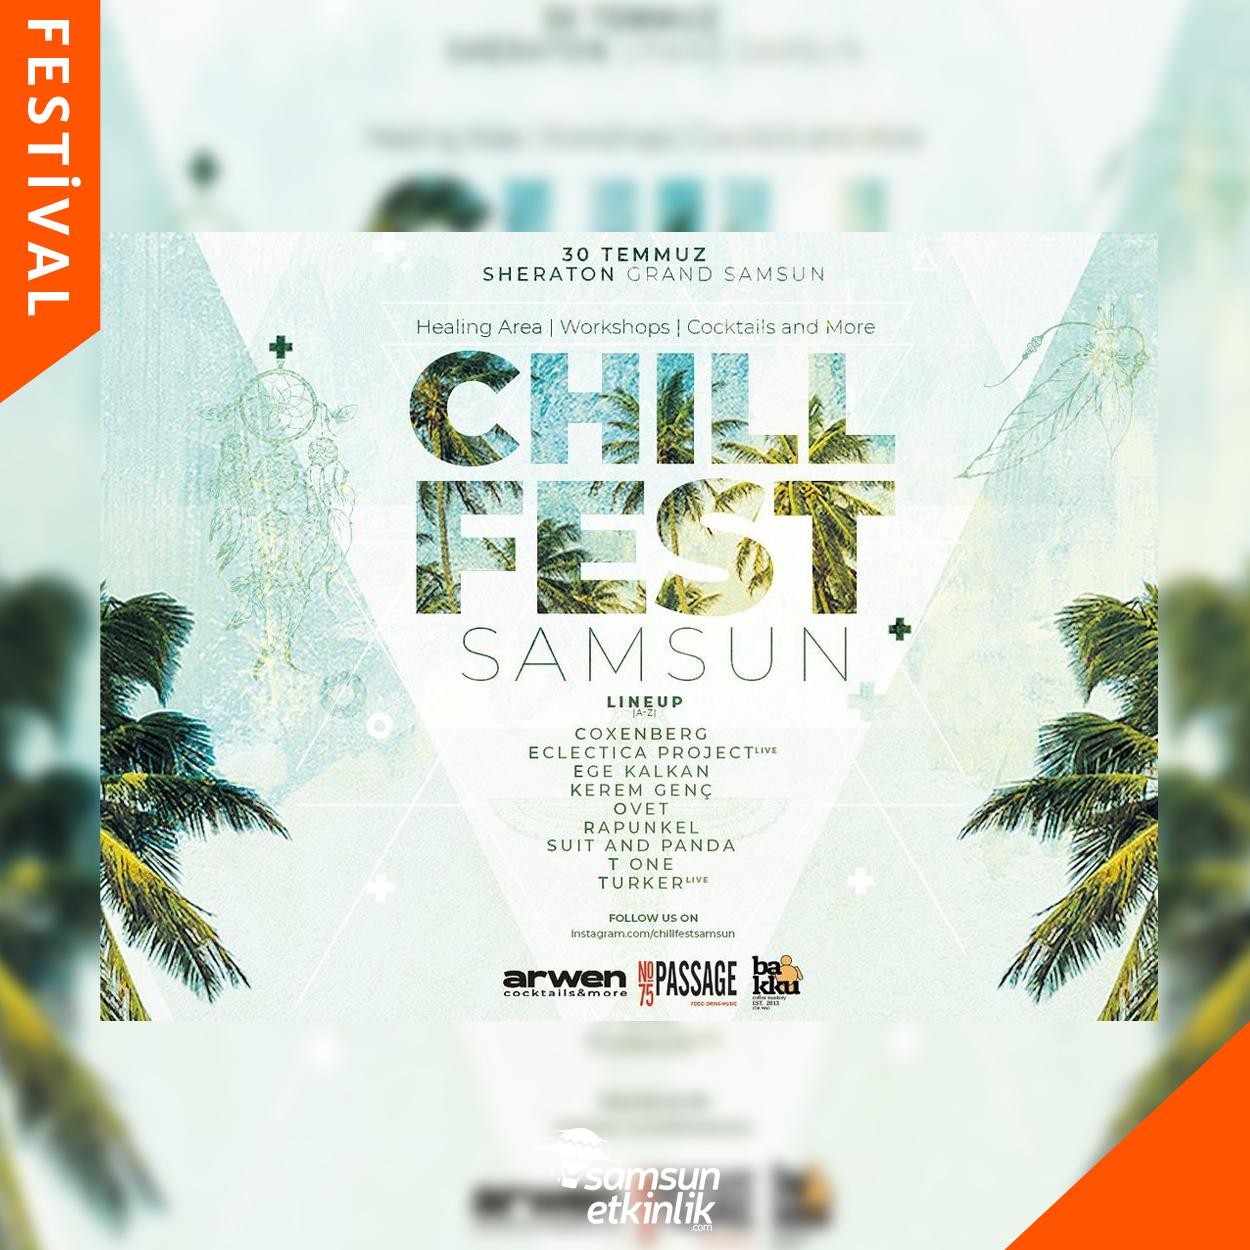 Chill Fest Samsun